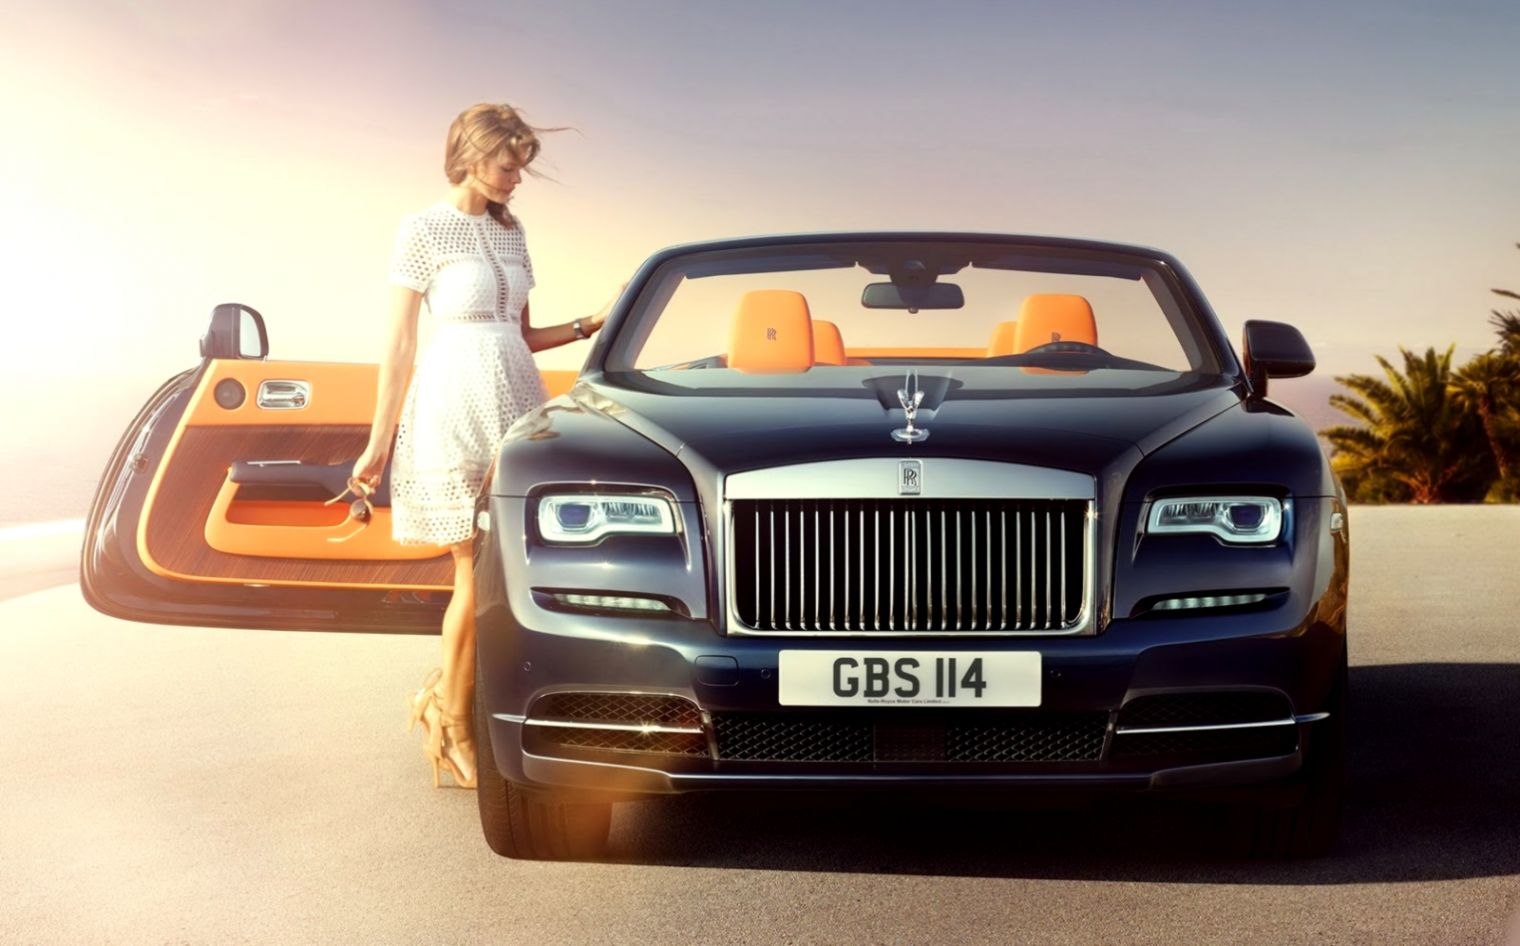 Rolls Royce Dawn HD wallpapers free download